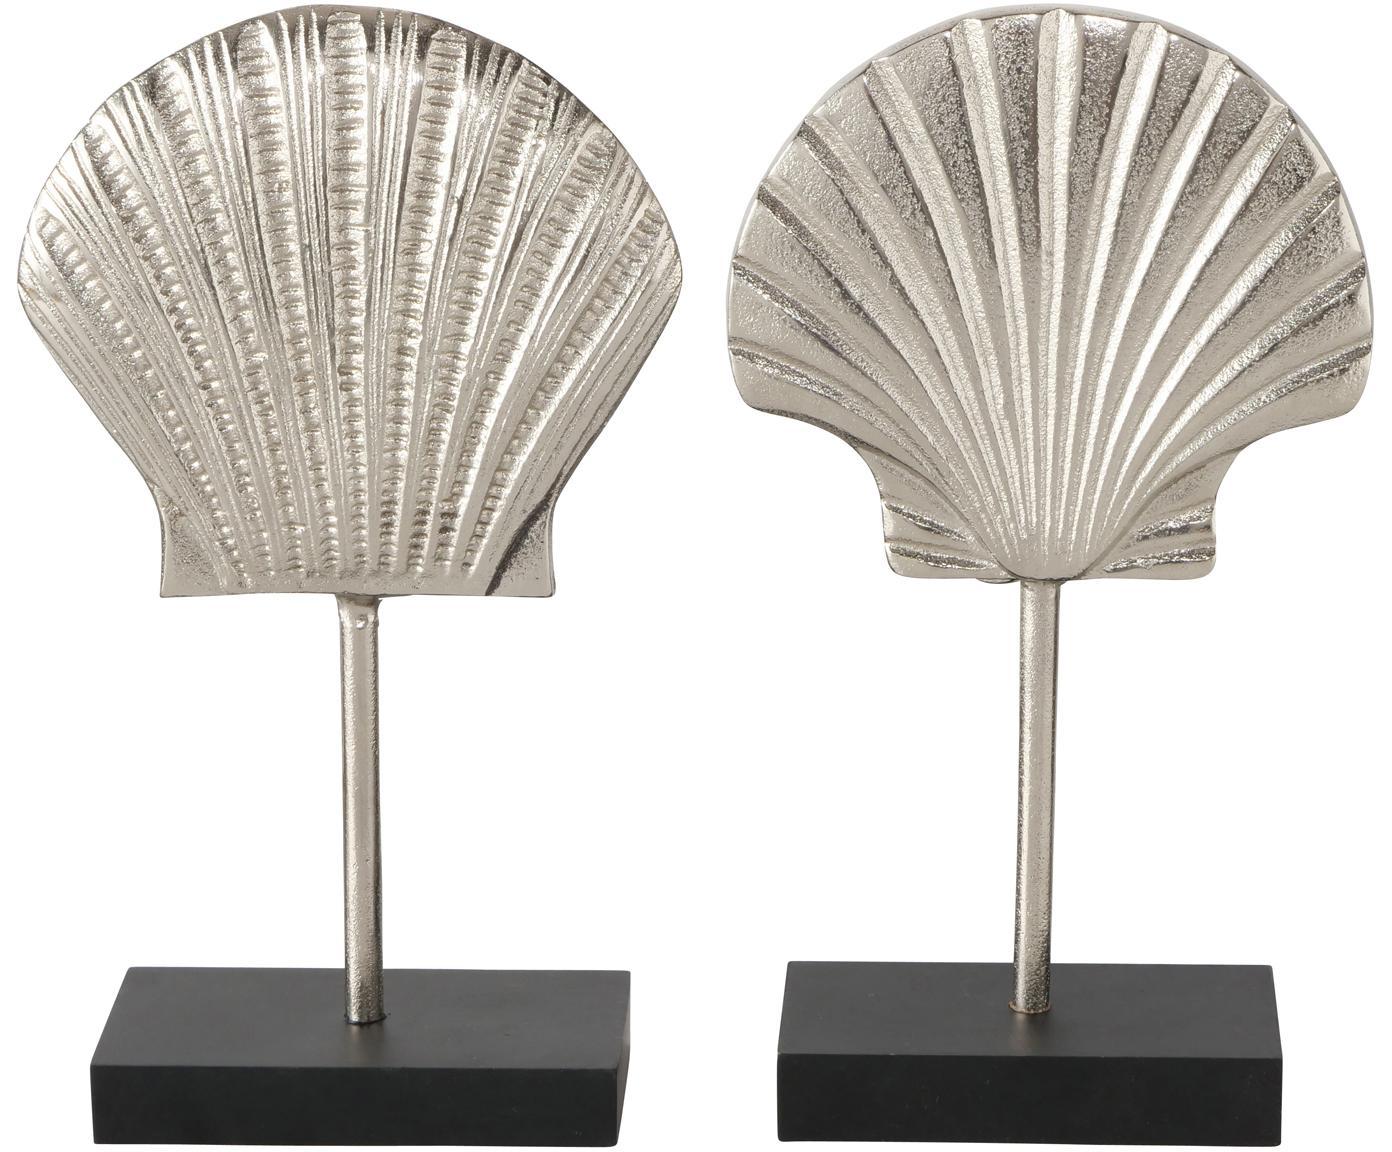 Deko-Objekte-Set Emmi, 2-tlg., Sockel: Holz, lackiert, Aluminium, Schwarz, 13 x 27 cm